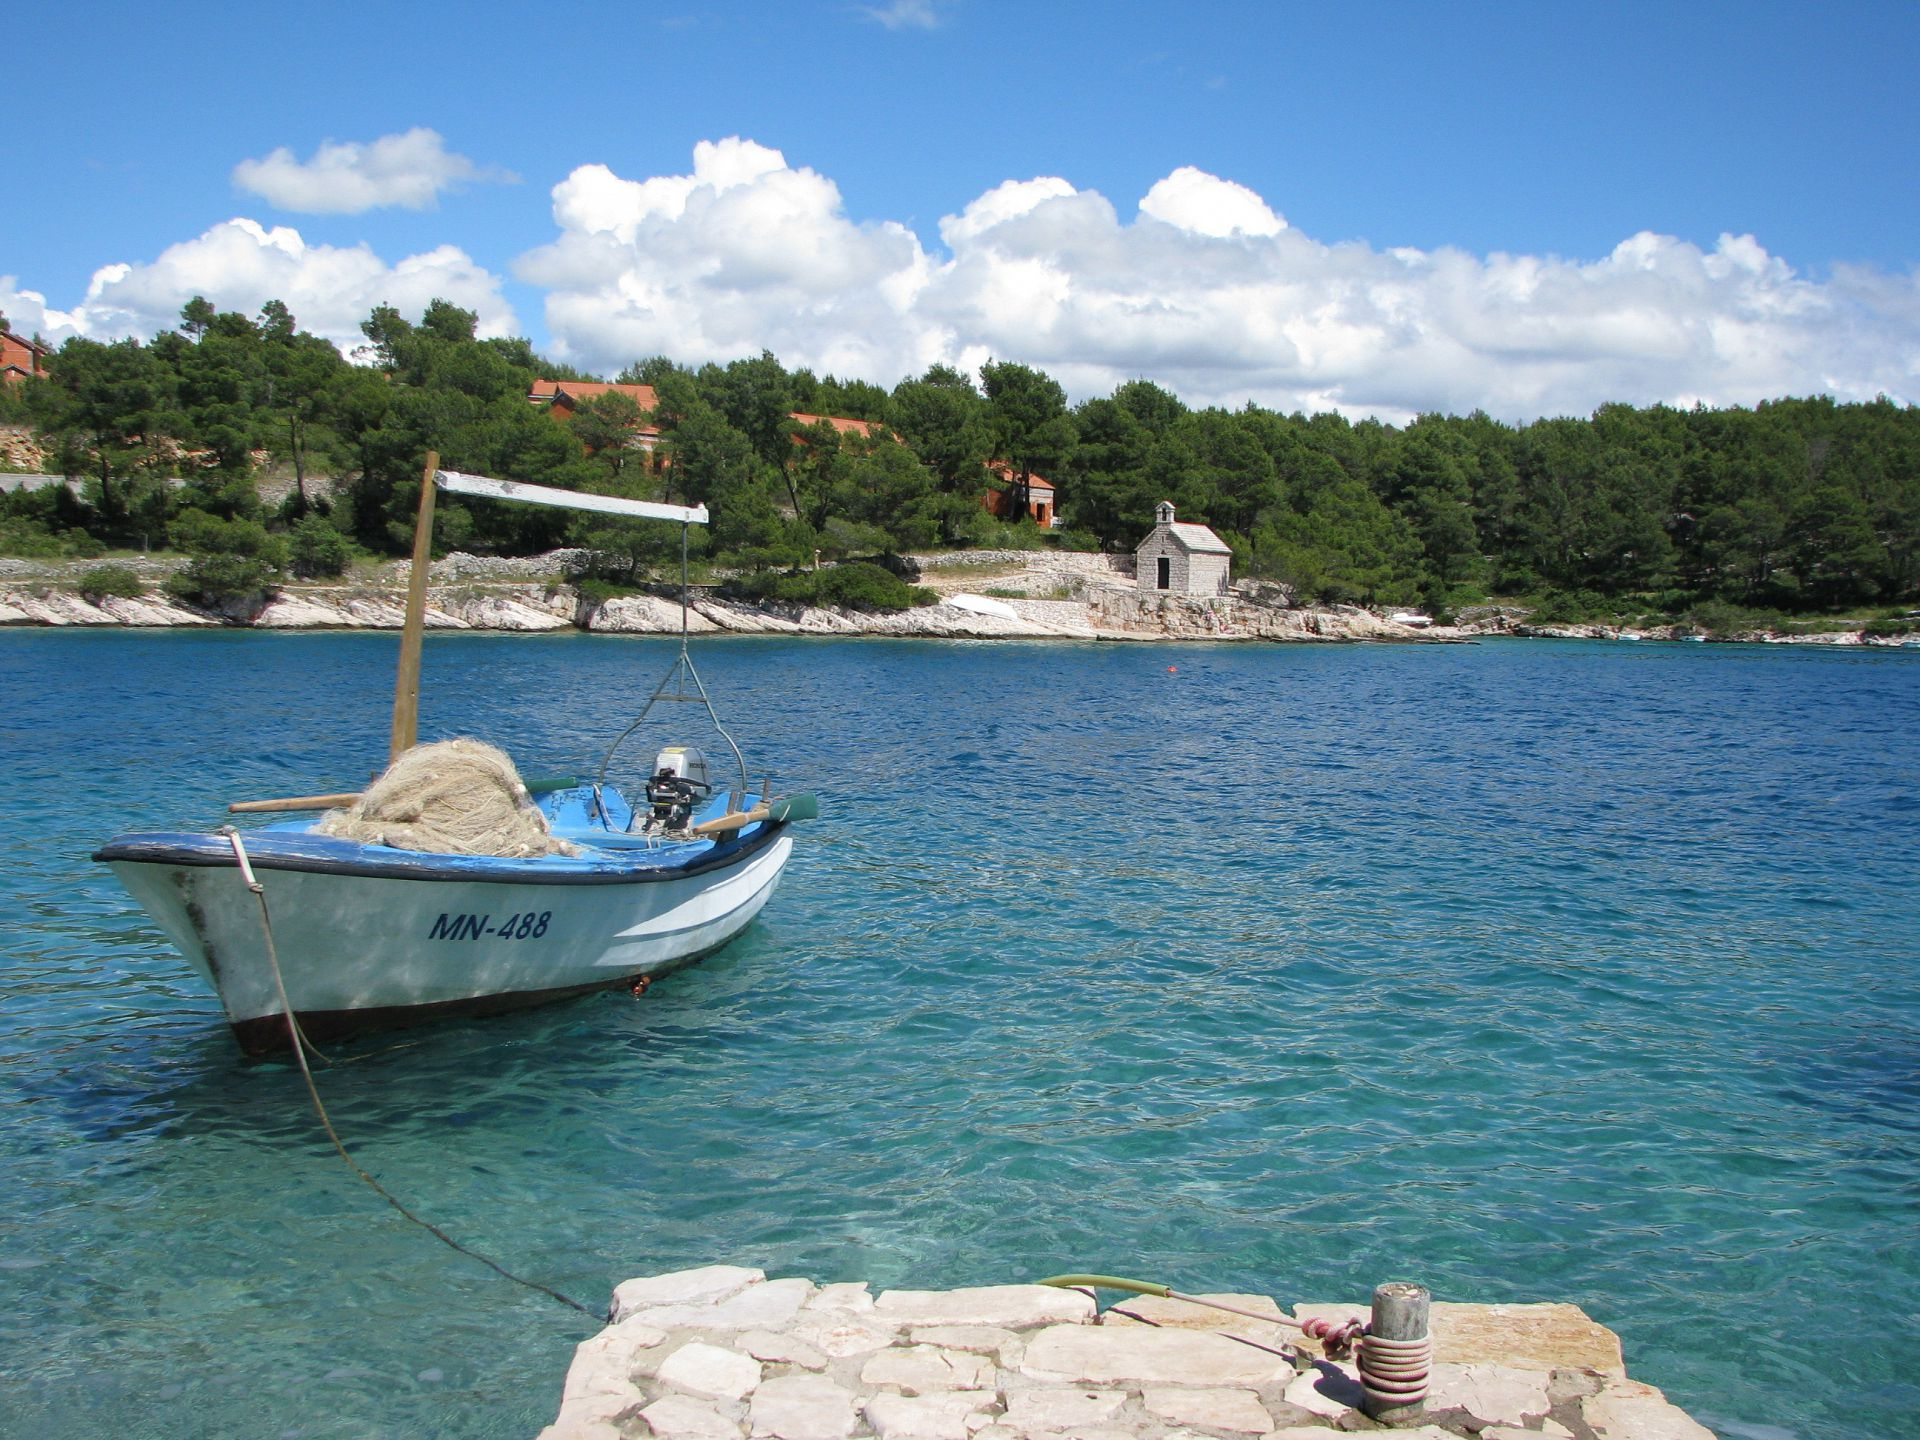 Simi - Baai Osibova (Milna) - Verblijf in lagunes Kroatië - strand